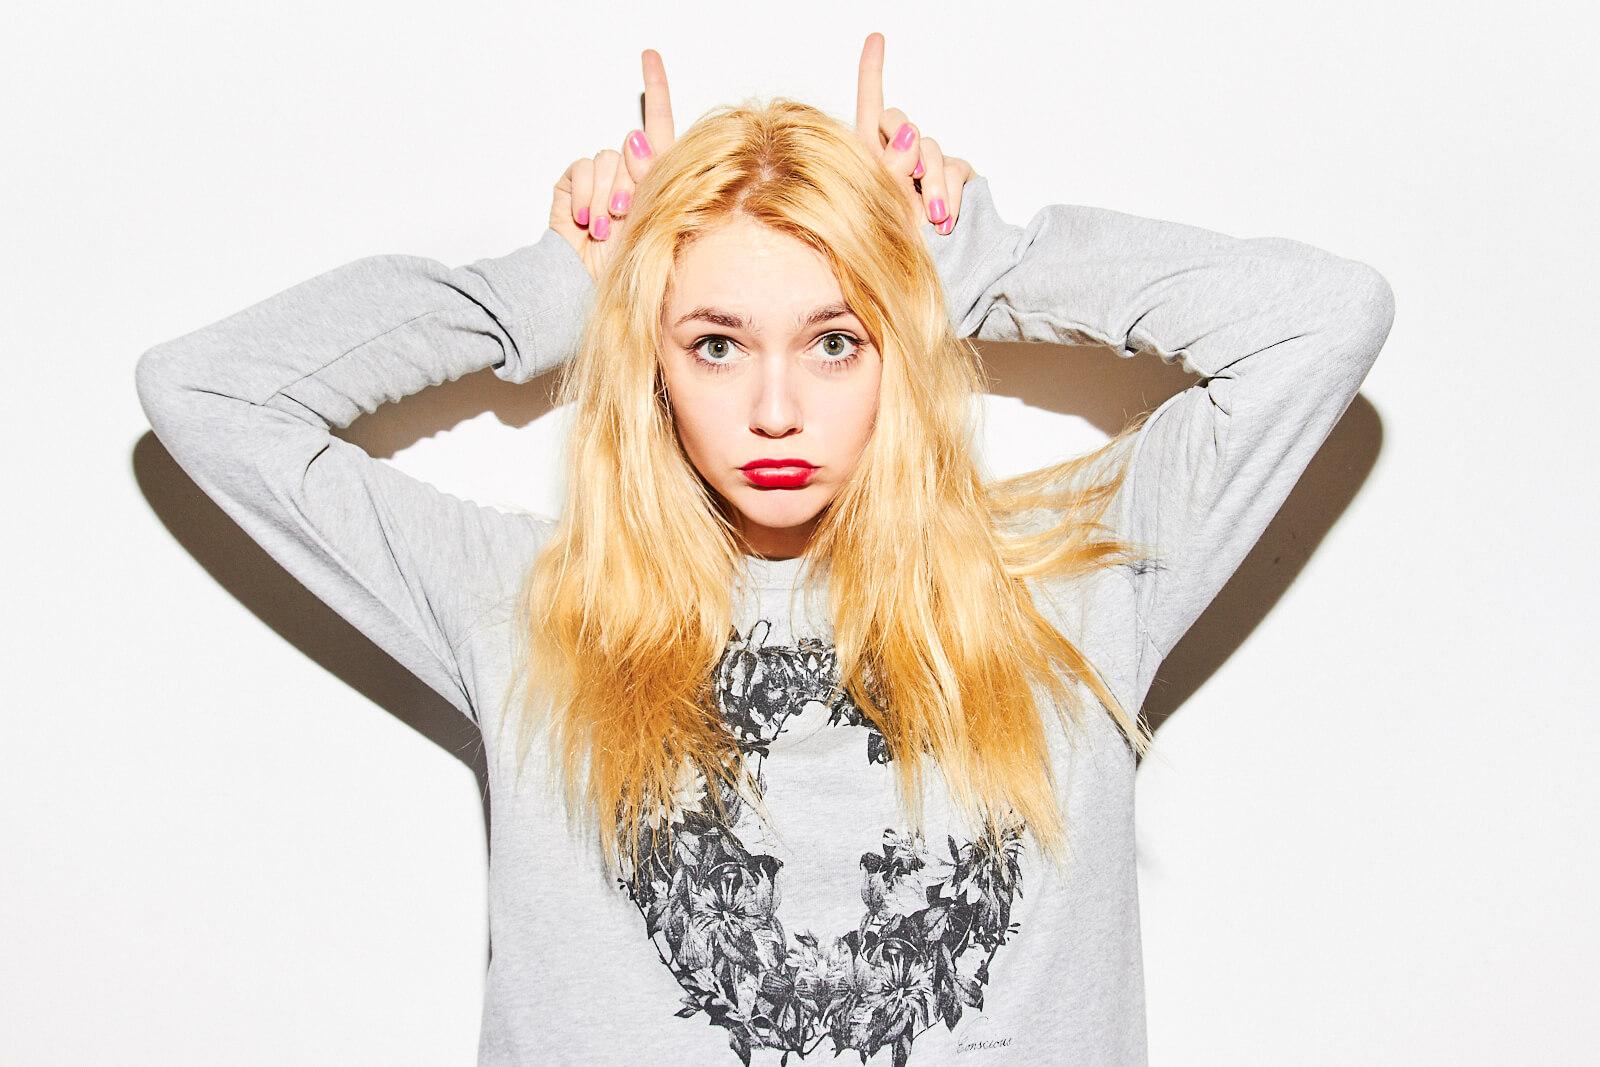 models-test-pola-agency 26